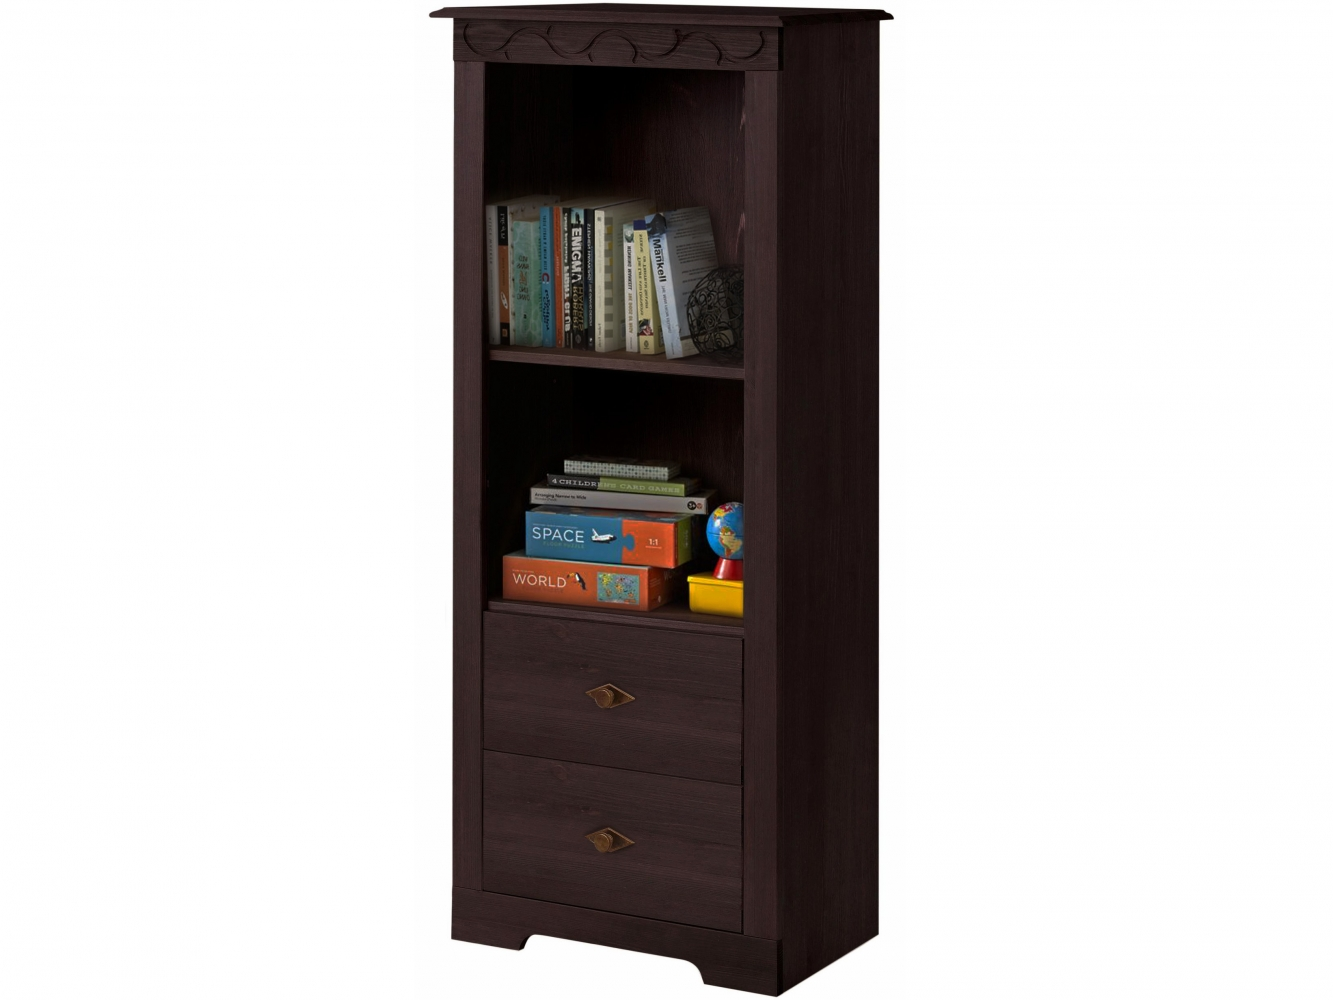 Regál/knihovna Londa, 140 cm, tmavě hnědá